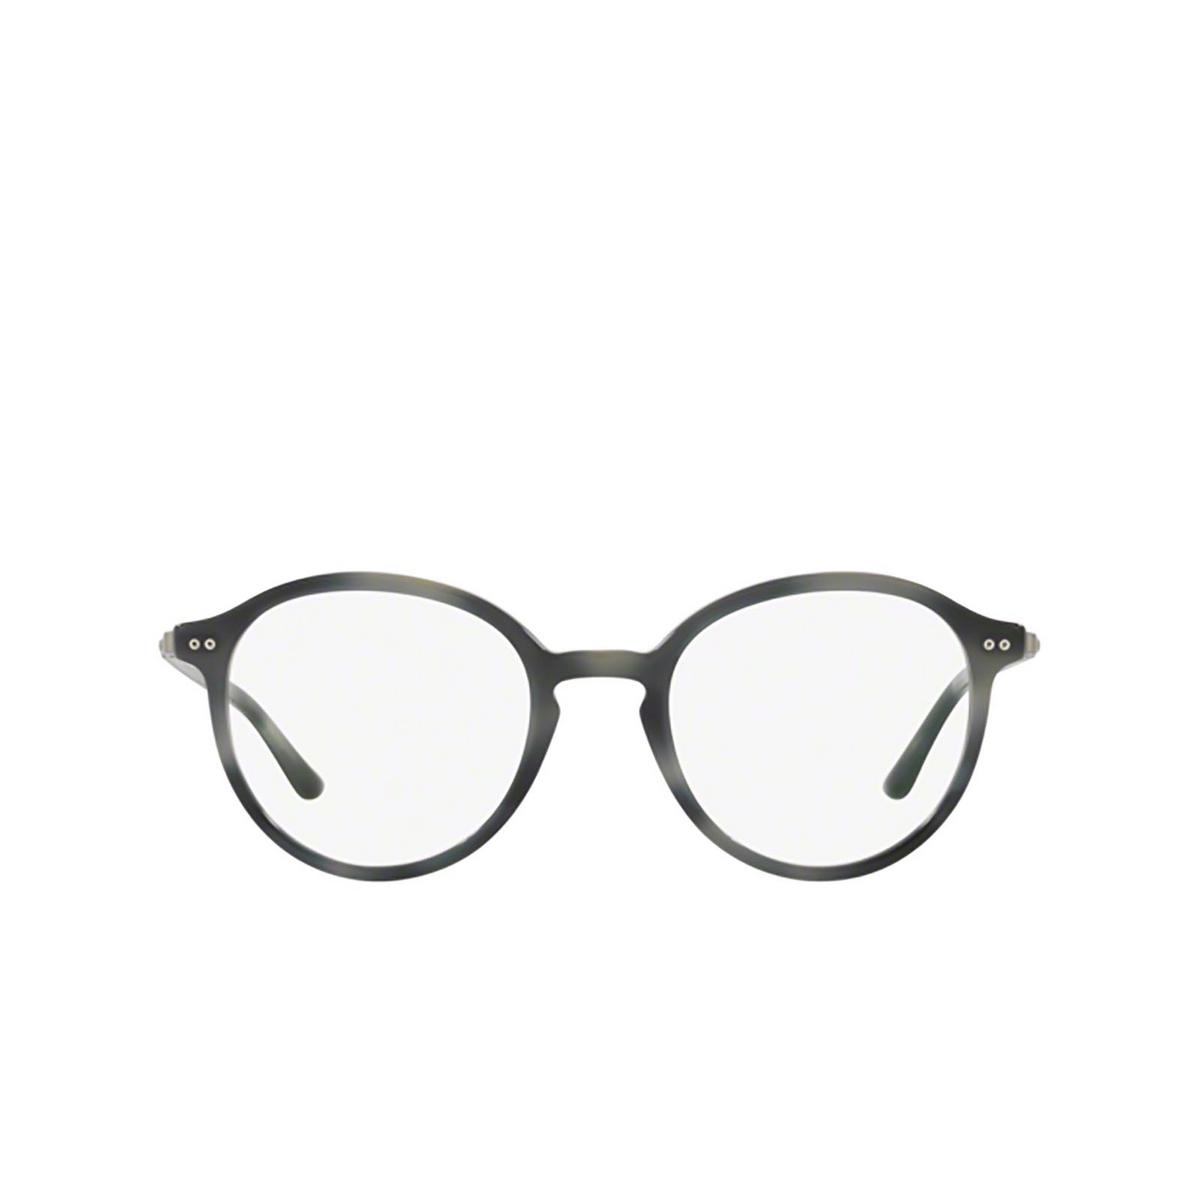 Giorgio Armani® Round Eyeglasses: AR7124 color 5572 - front view.